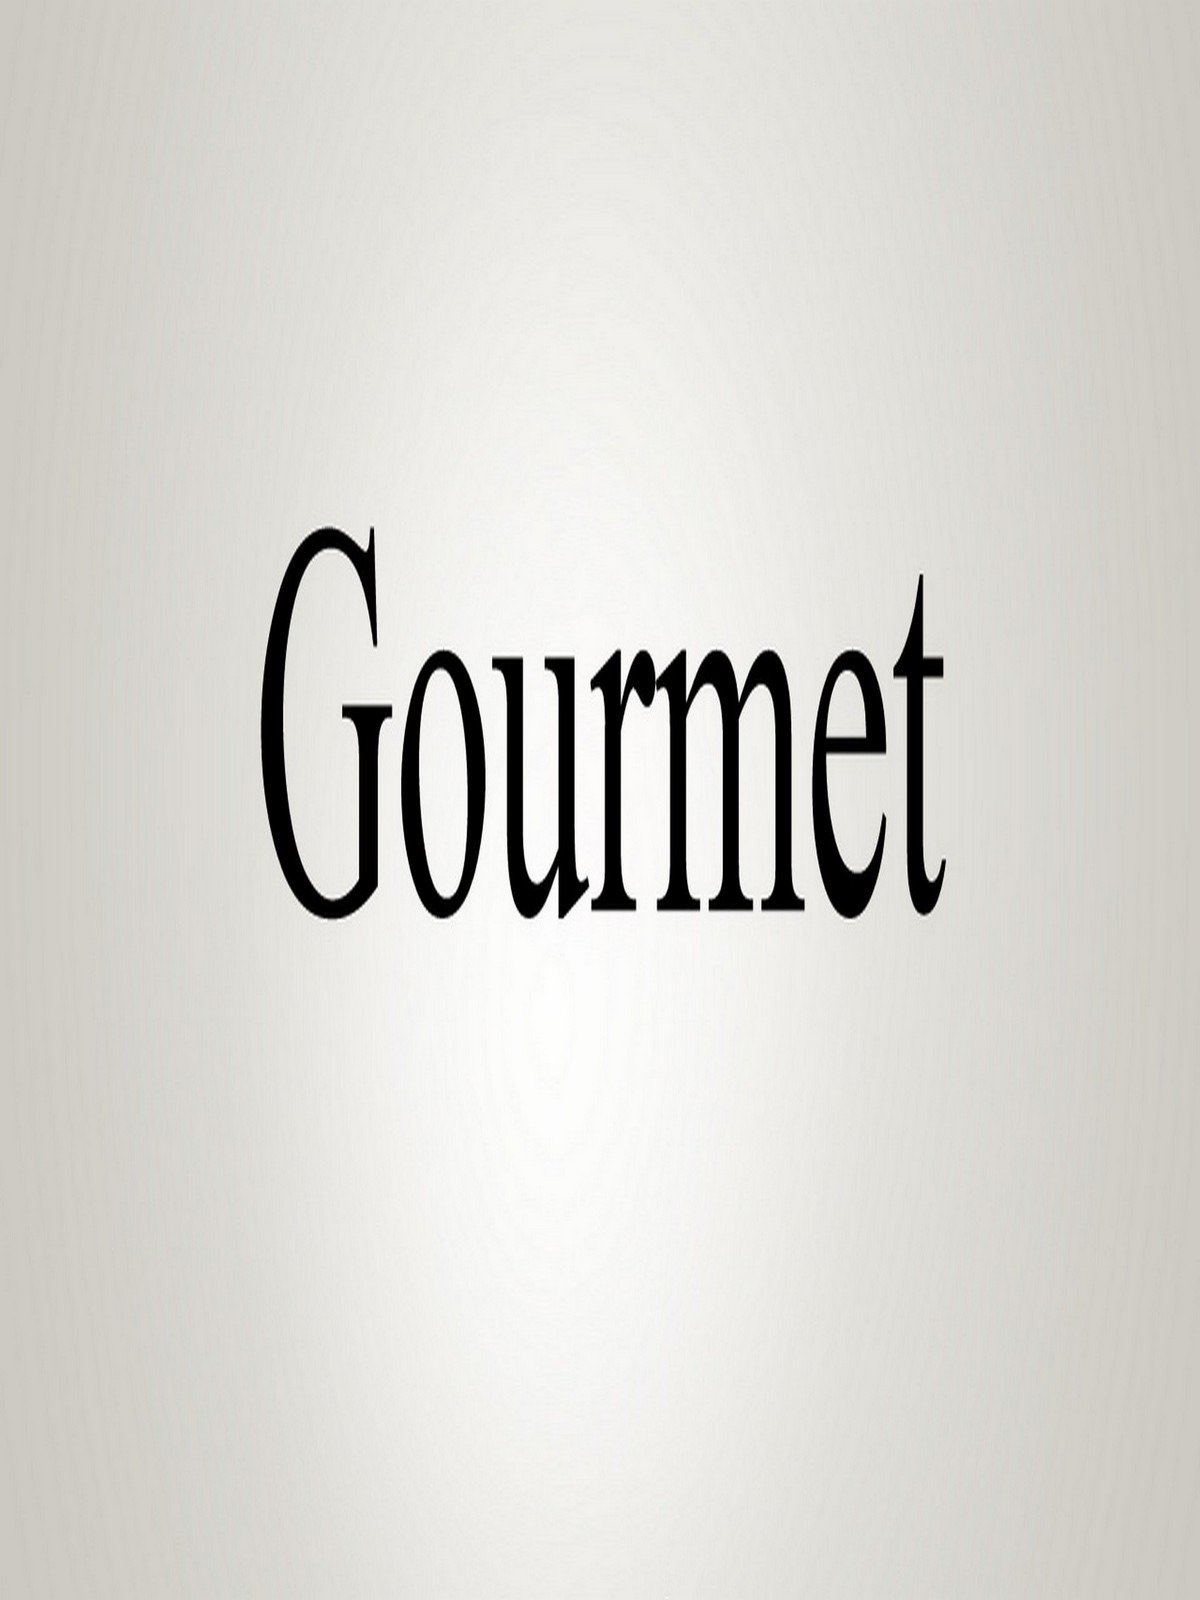 Amazon.de: How To Pronounce Gourmet [OV] ansehen  Prime Video